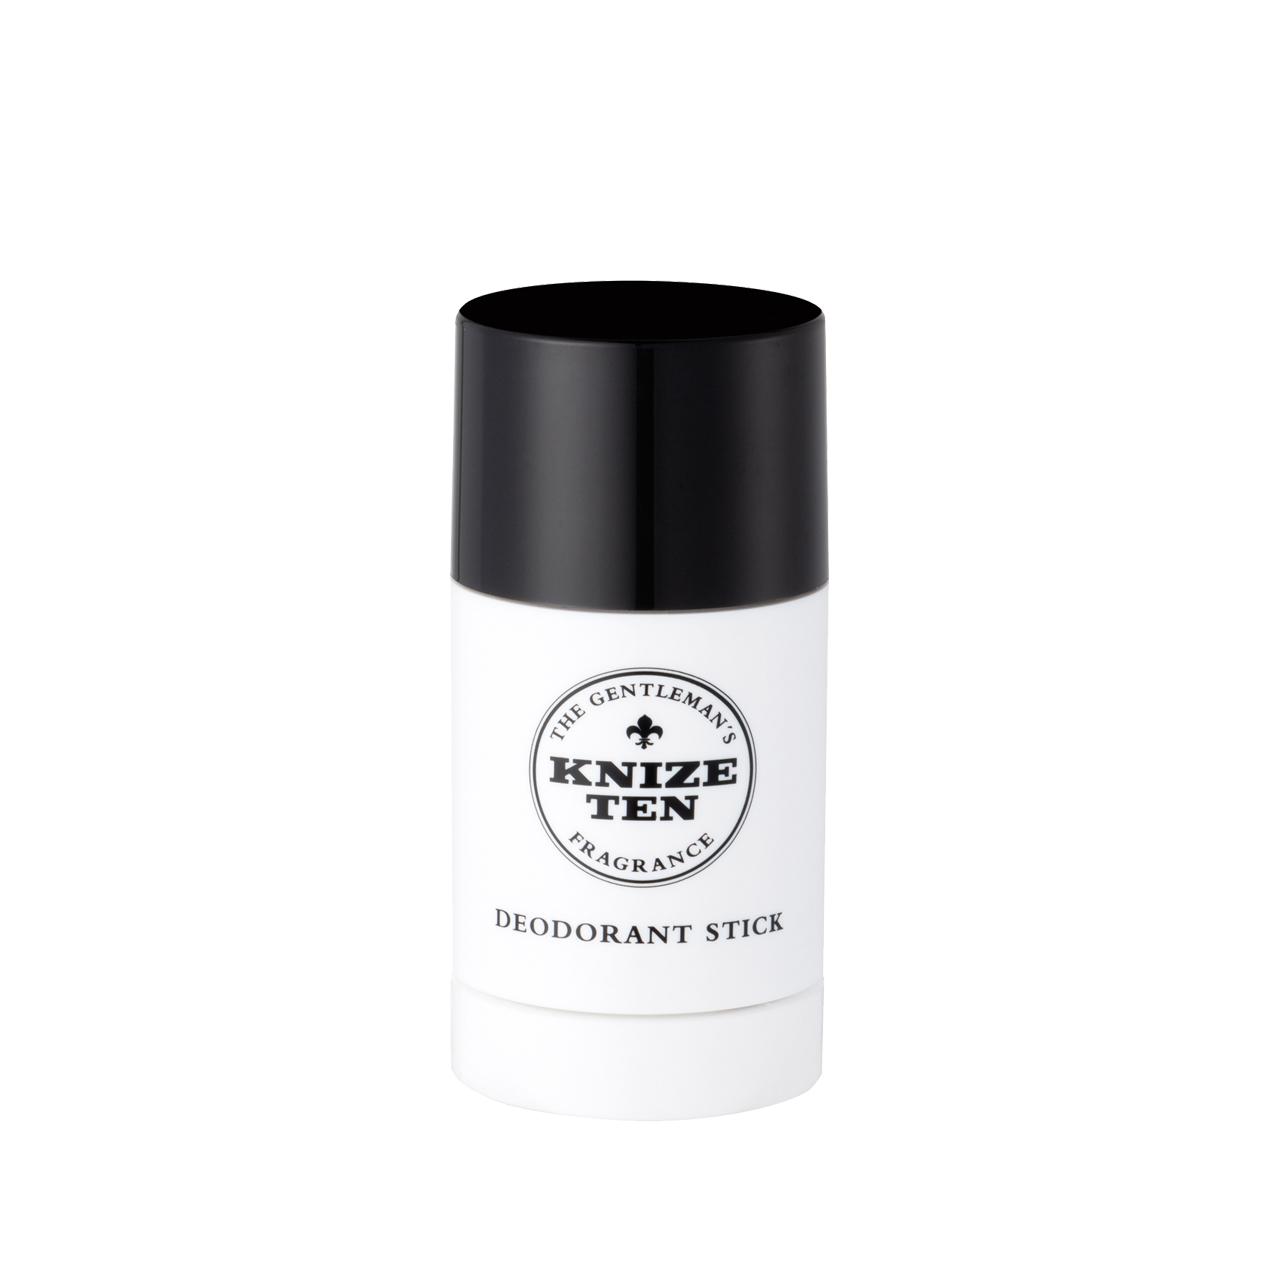 Ten - Deodorant Stick